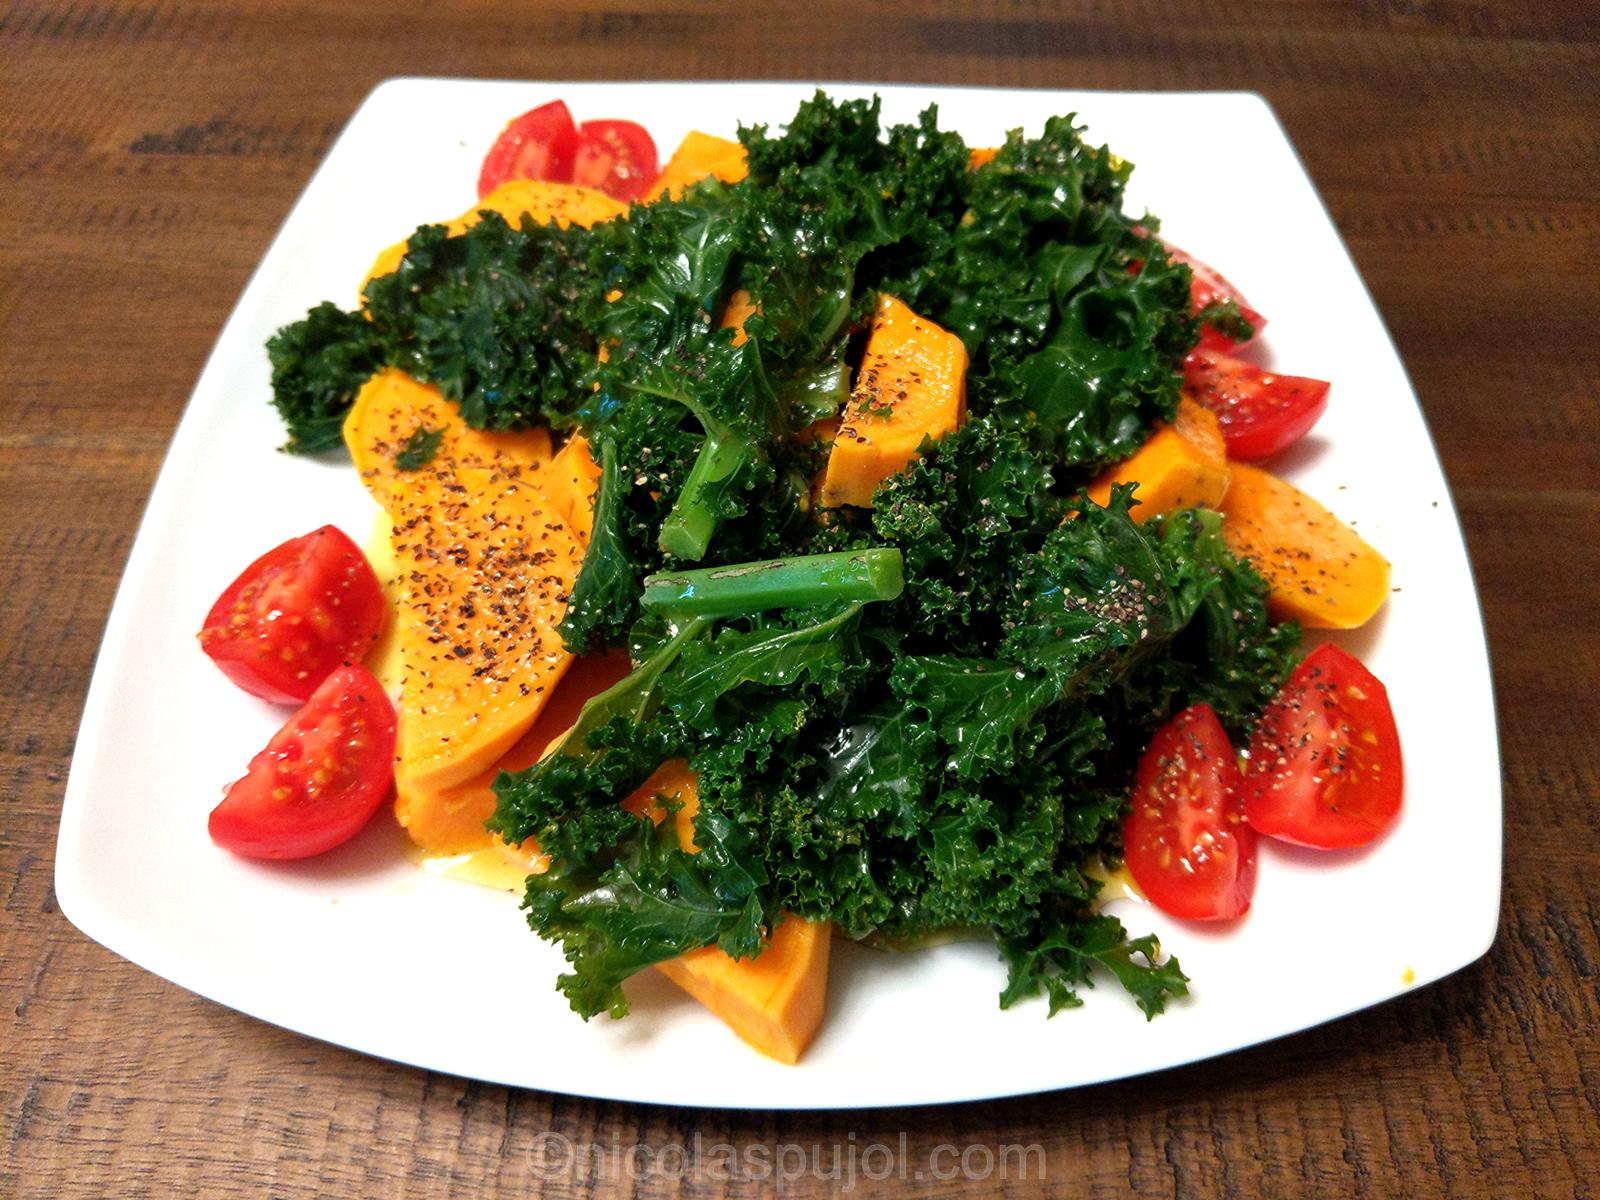 Vegan, paleo and gluten free kale sweet potato salad